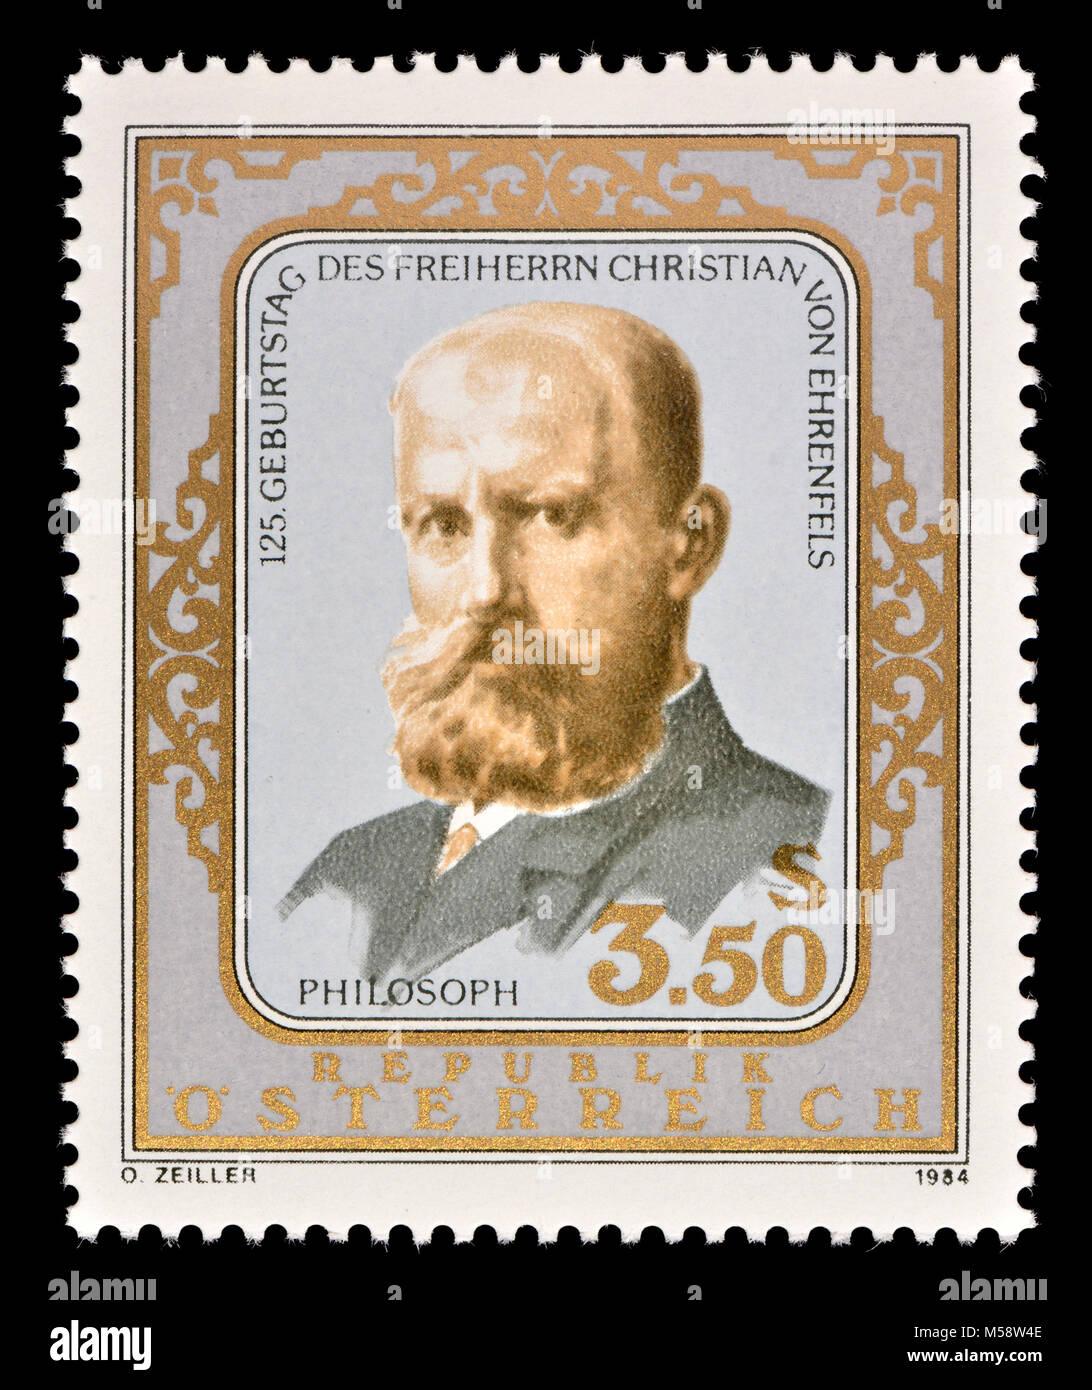 Austrian francobollo (1984) : Christian von Ehrenfels (Maria Christian Julius Leopold Freiherr von Ehrenfels; 1859 Immagini Stock